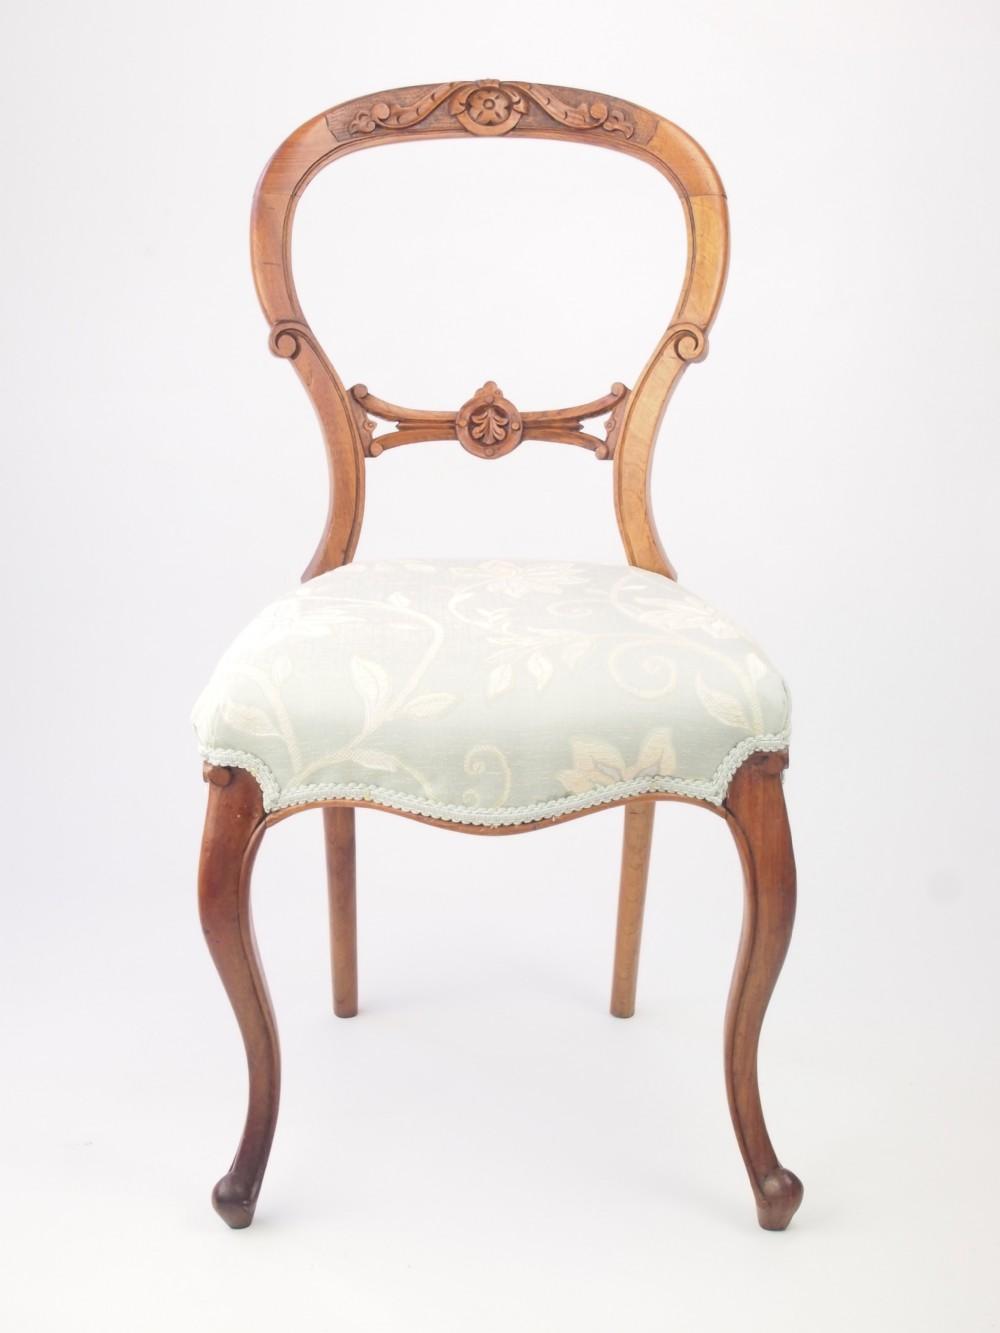 Antique Victorian Walnut Balloon Back Chair 286166